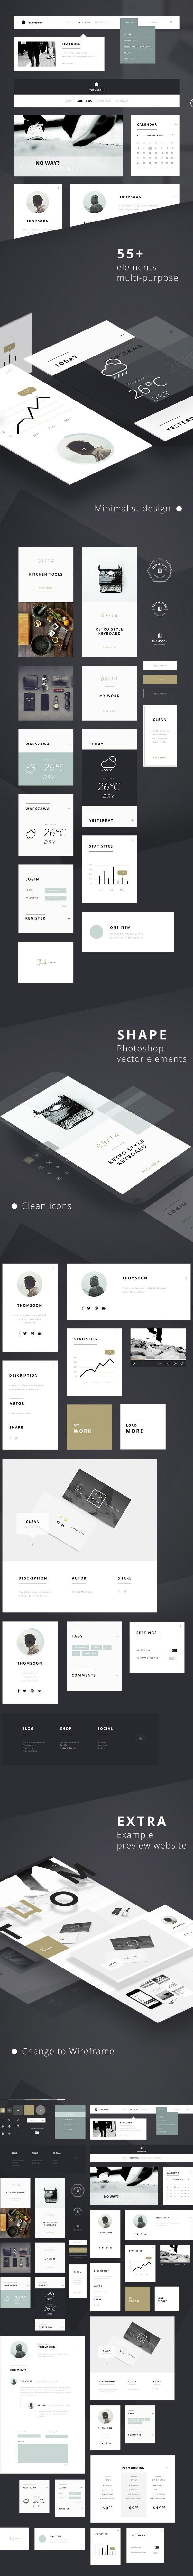 55 Free UI Kit Elements